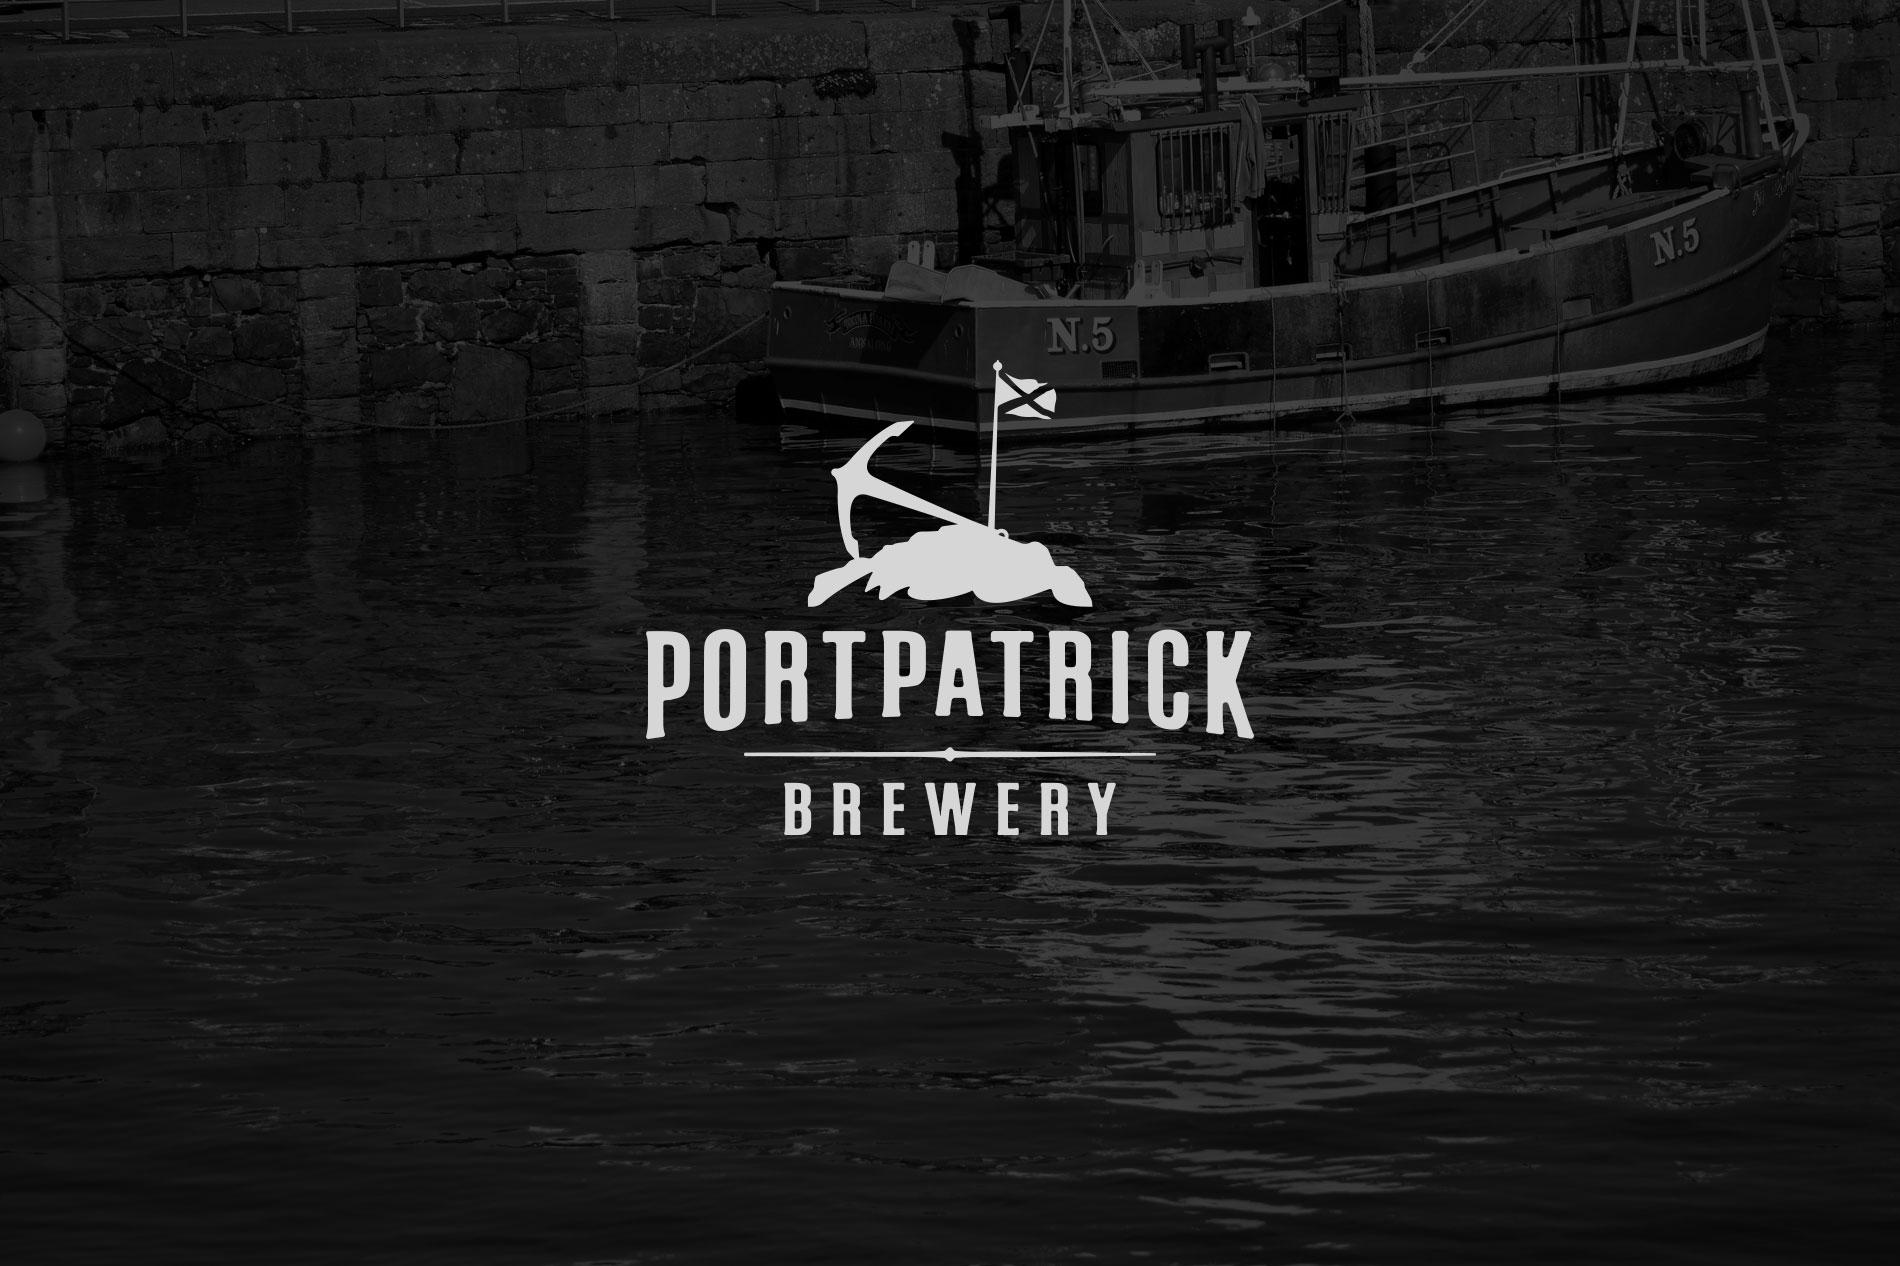 Portpatrick Brewery Beer Label Series Design